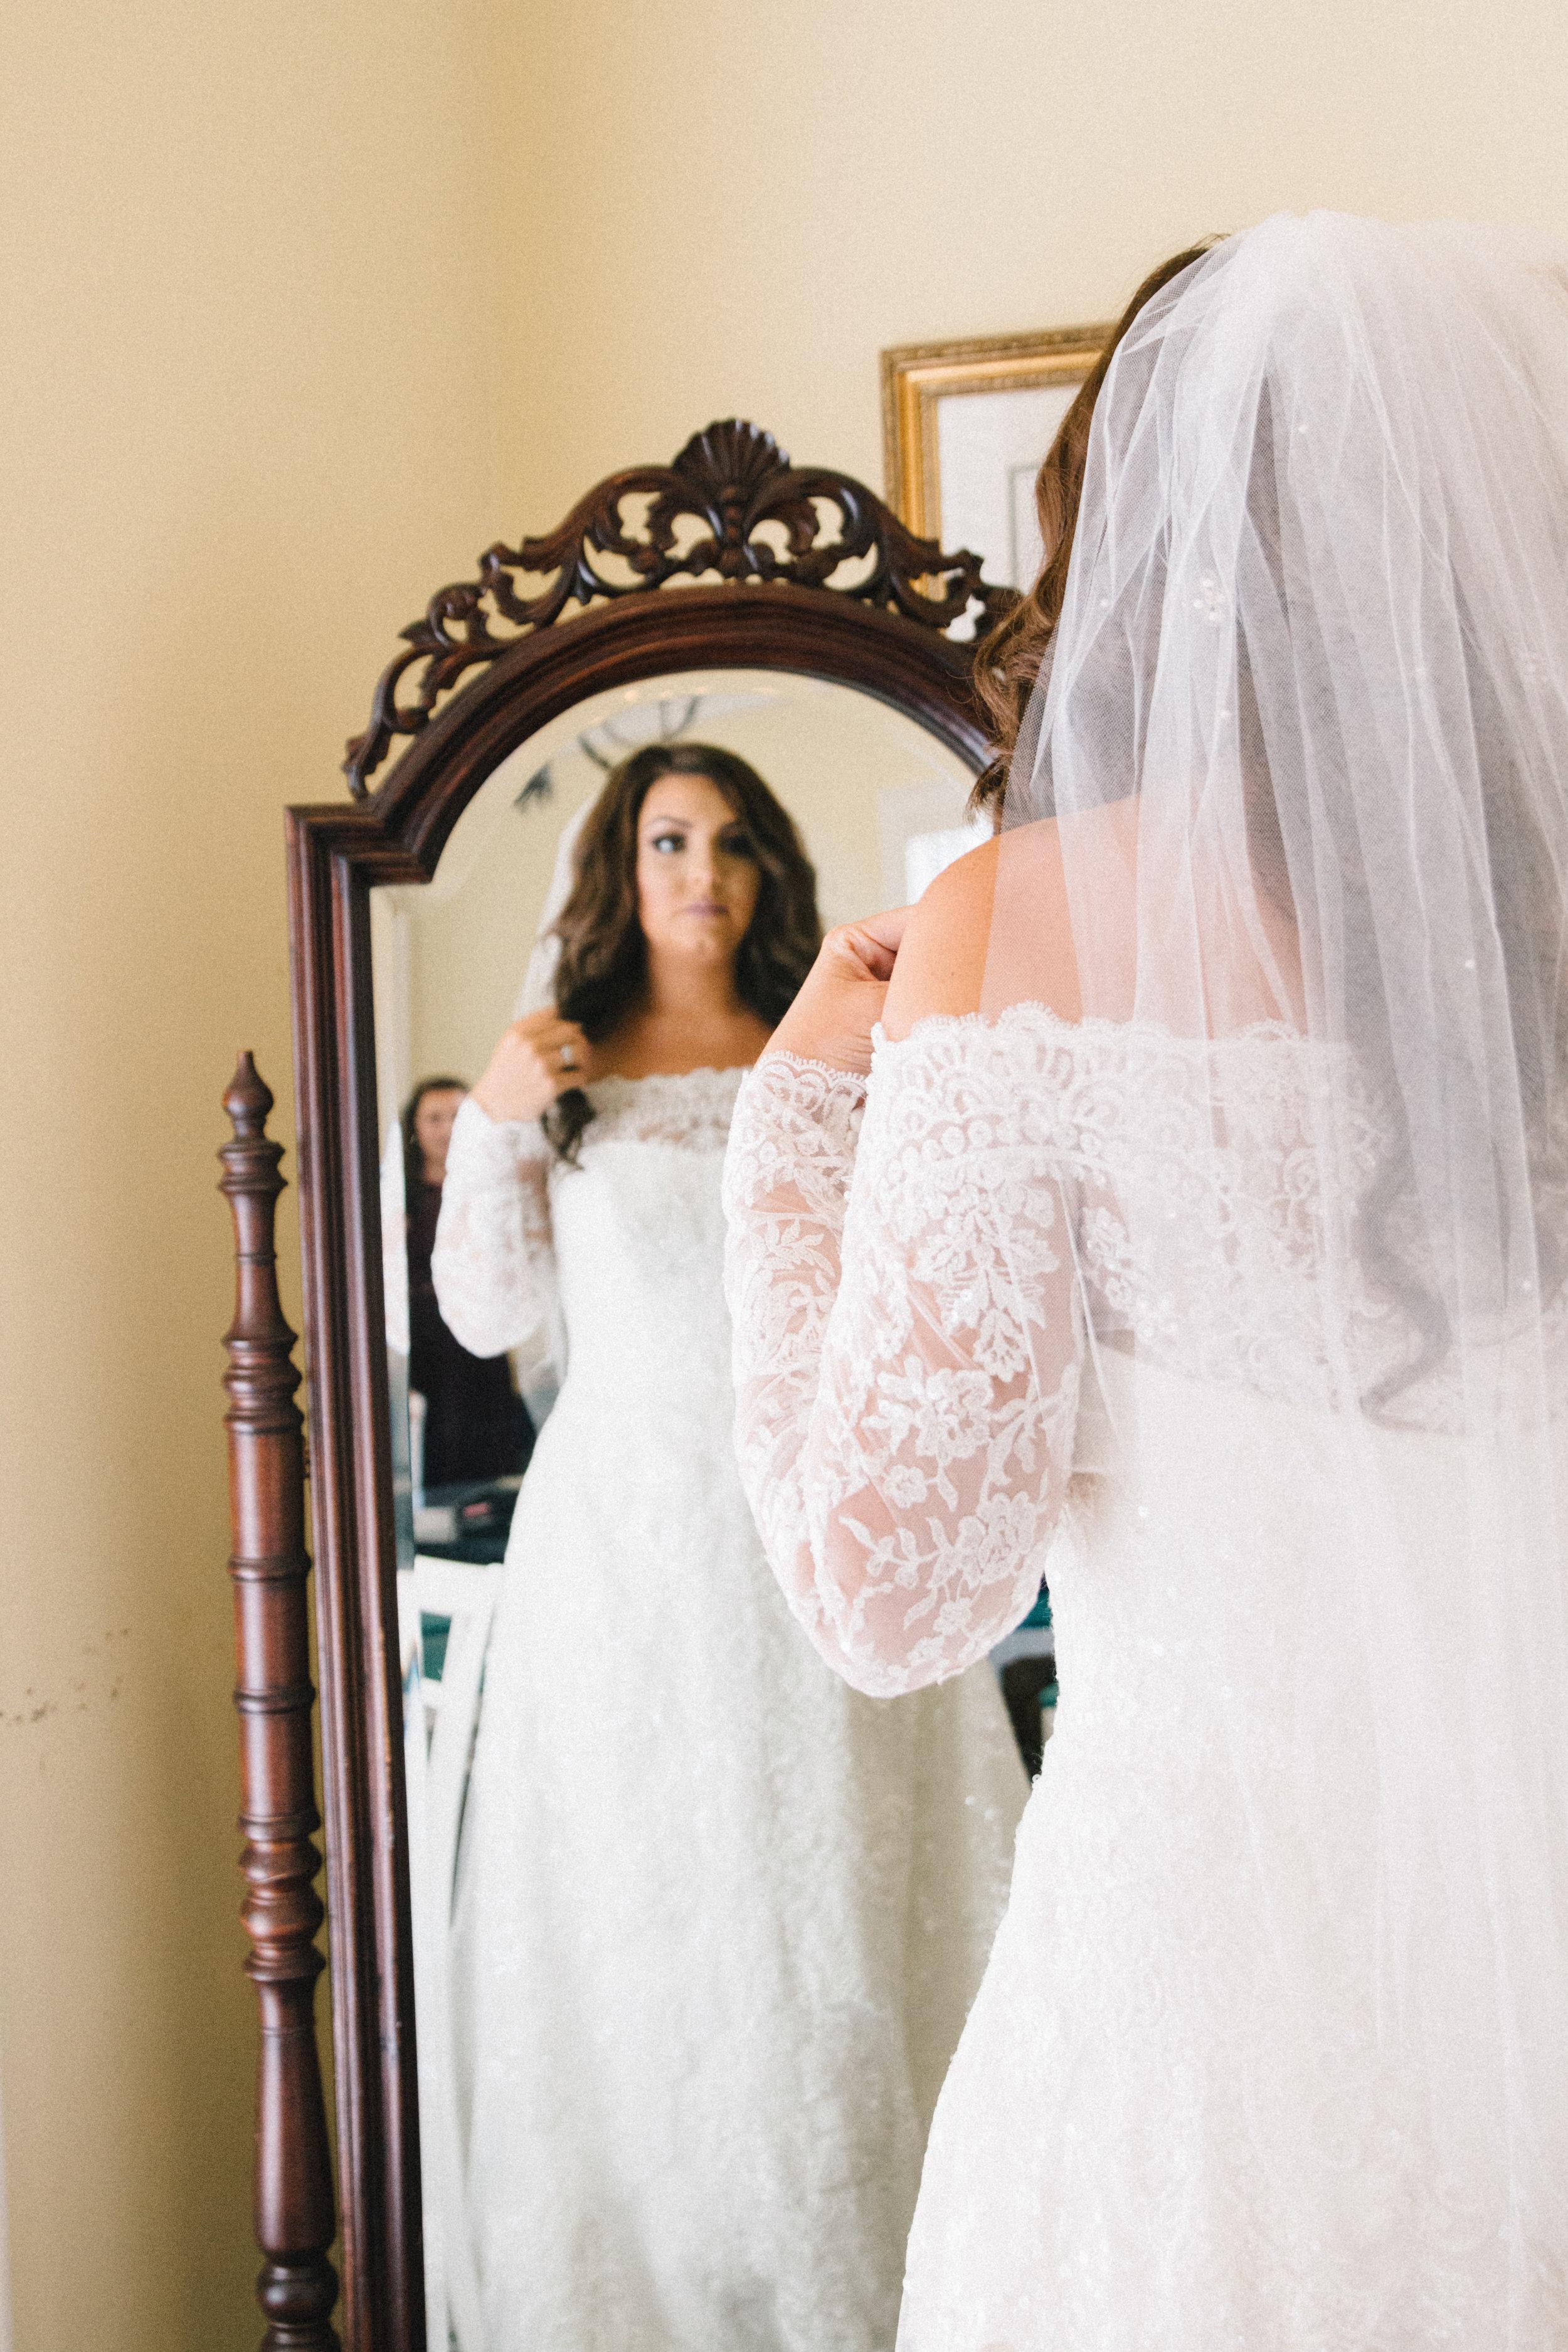 clipa_bridals-71.jpg